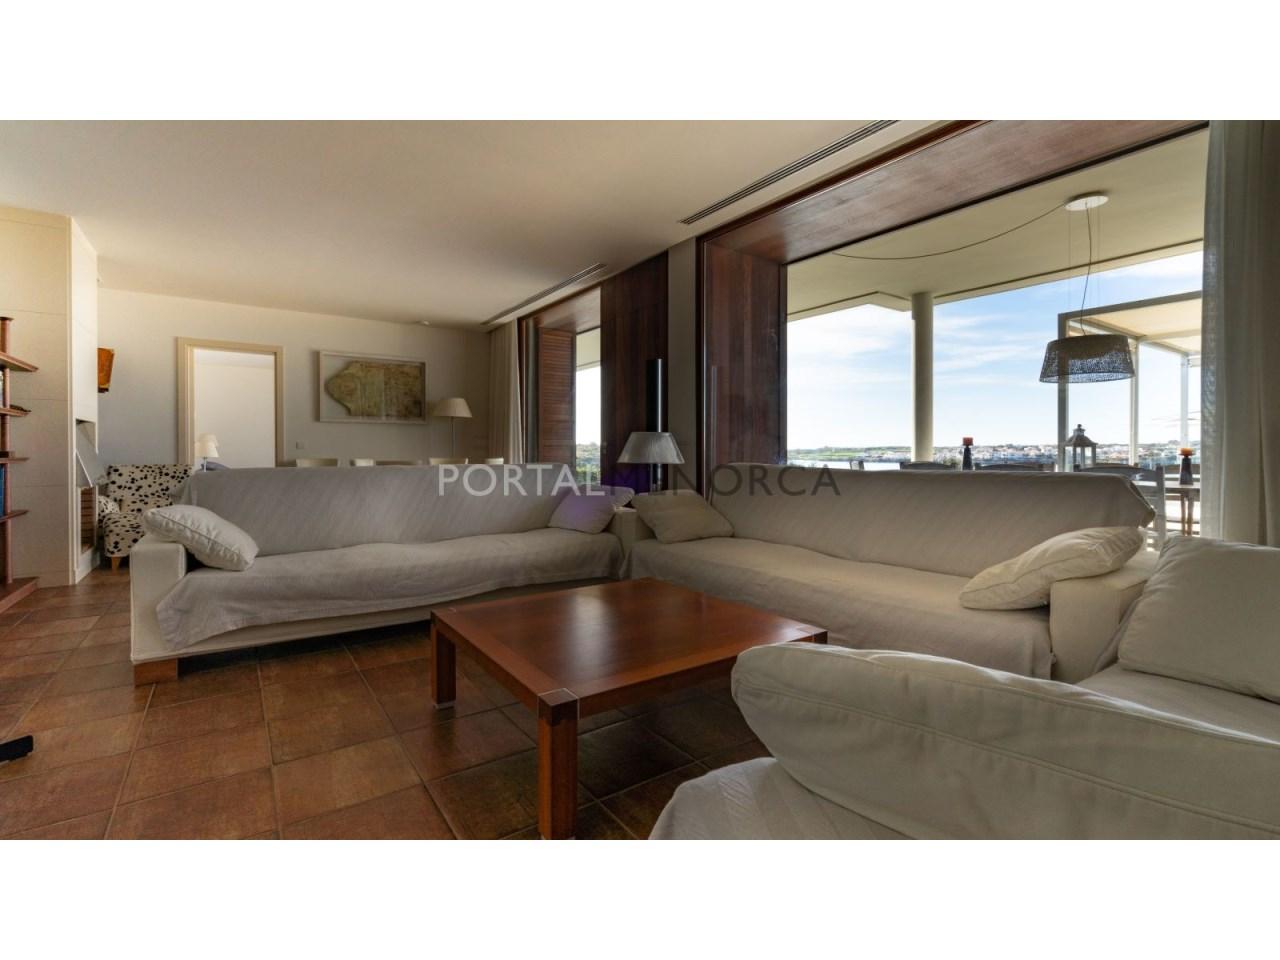 luxe-maison-vendre-acheter-menorca (7)